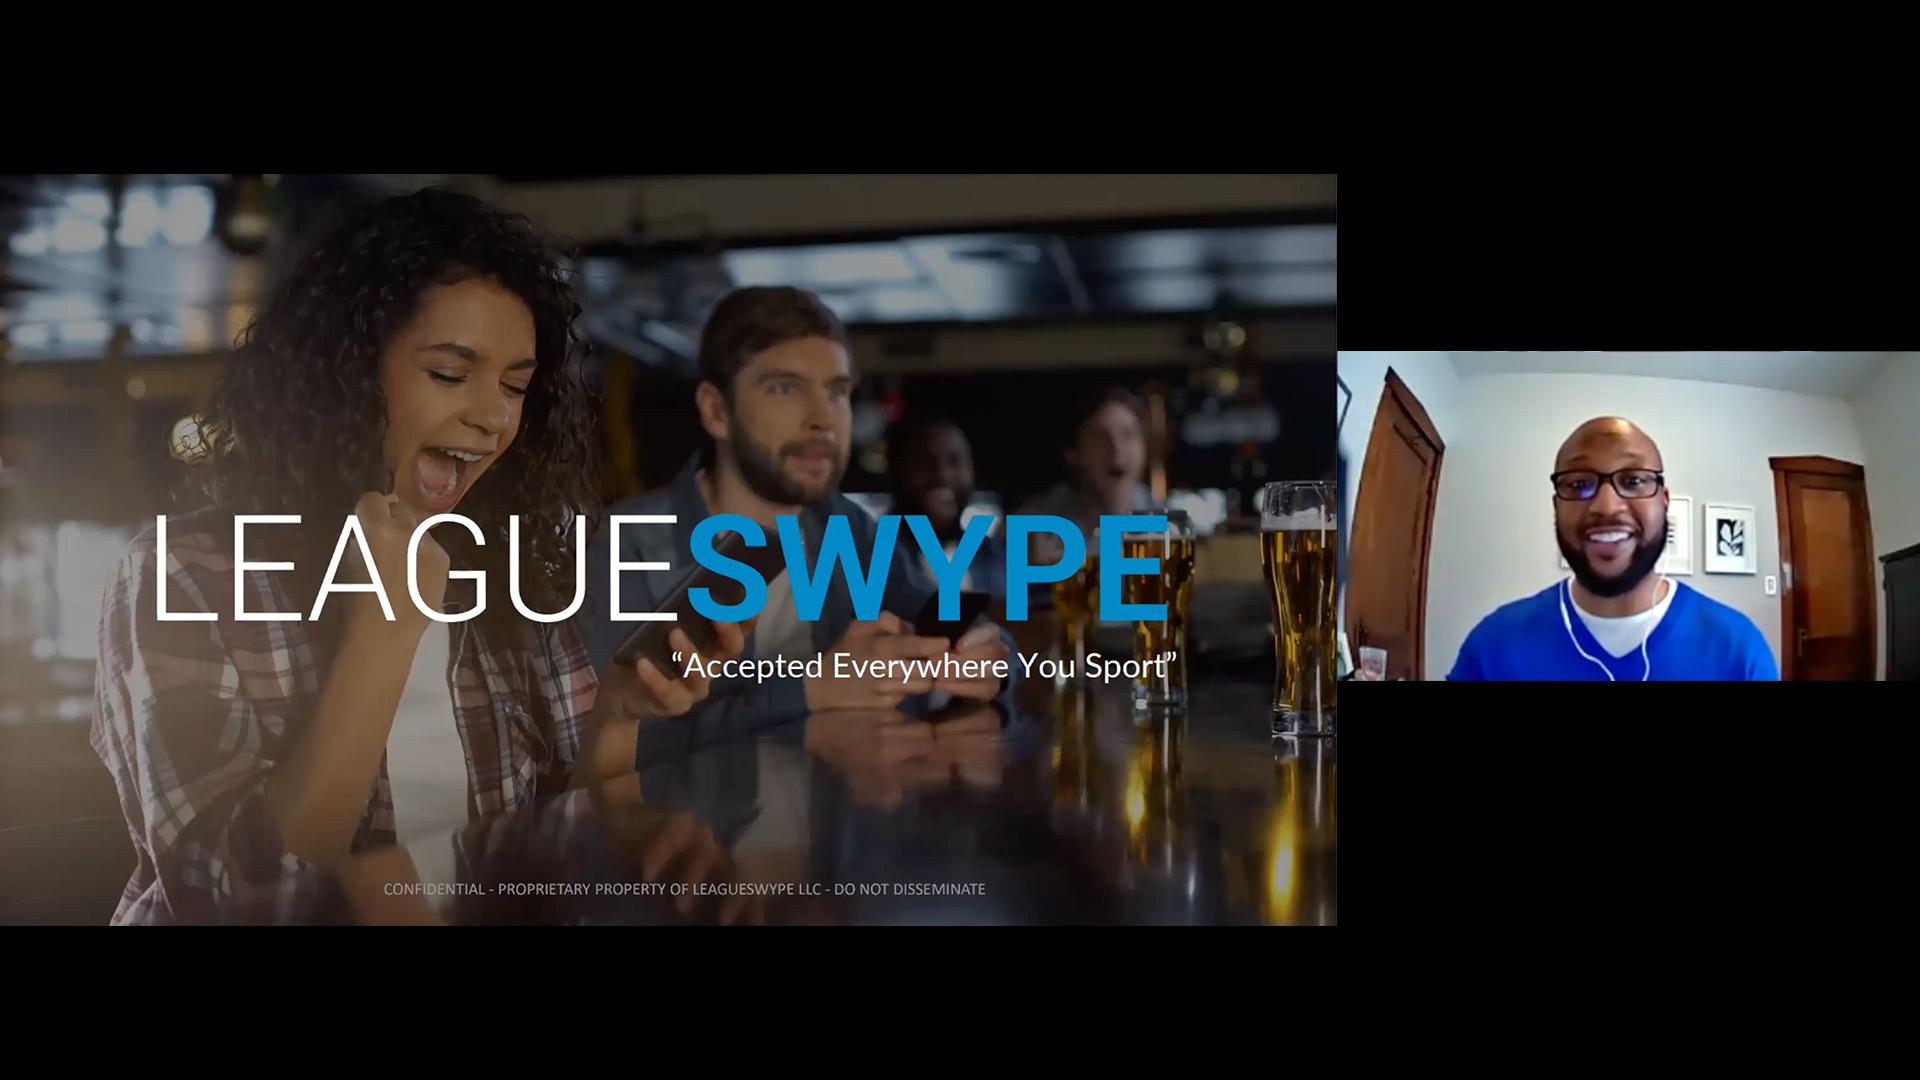 League Swype